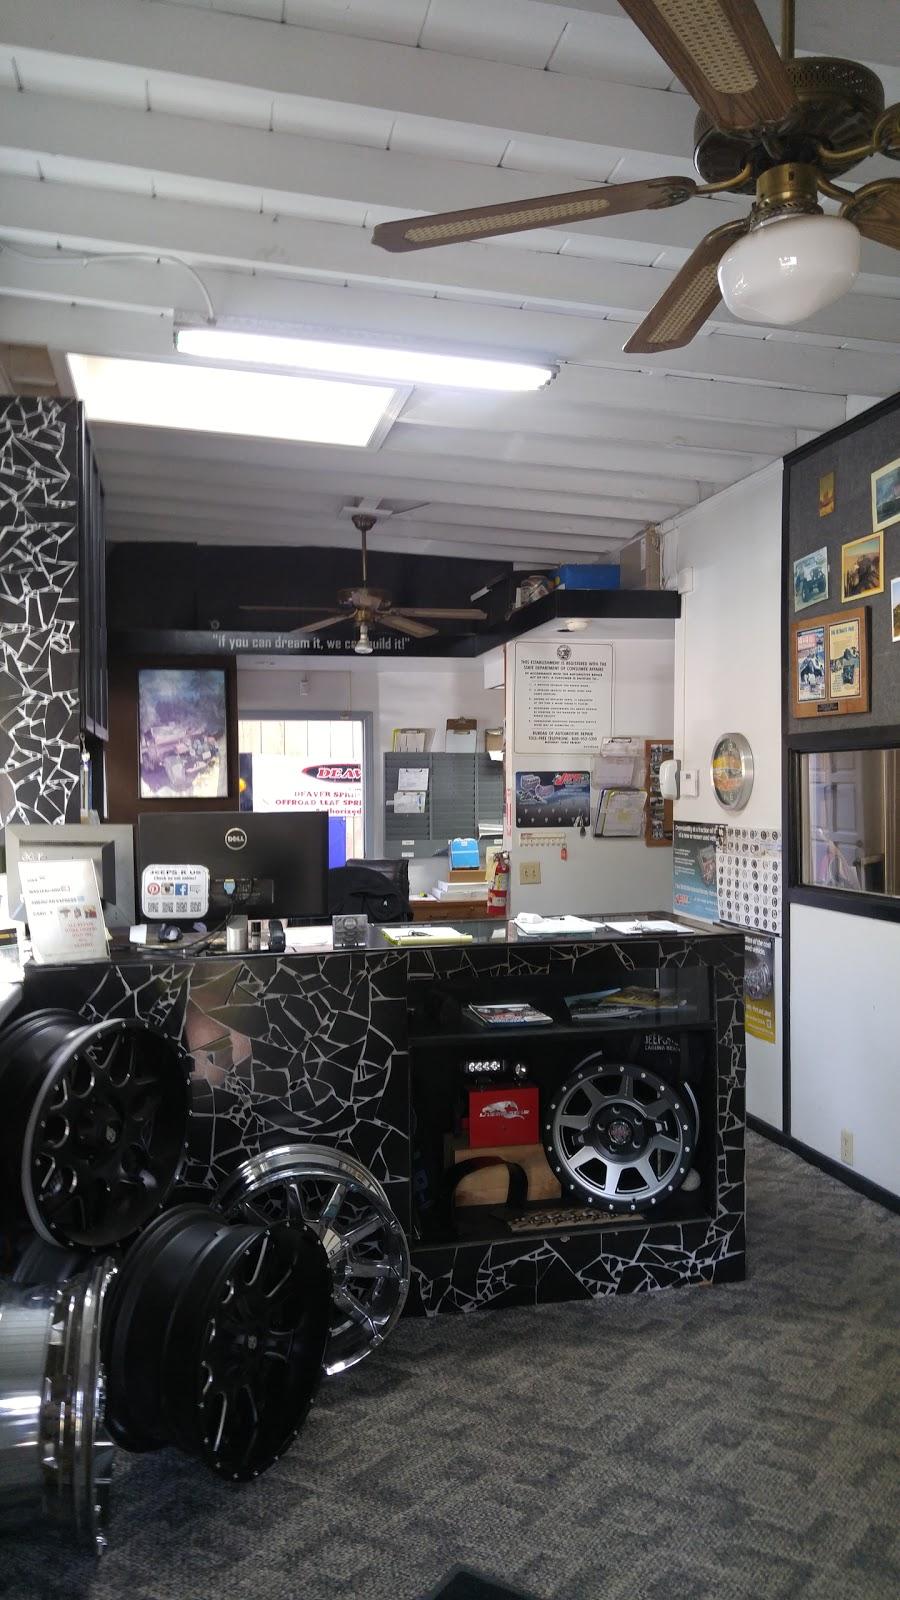 Jeeps R Us - car dealer    Photo 10 of 10   Address: 3231 Laguna Canyon Rd, Laguna Beach, CA 92651, USA   Phone: (949) 497-9183